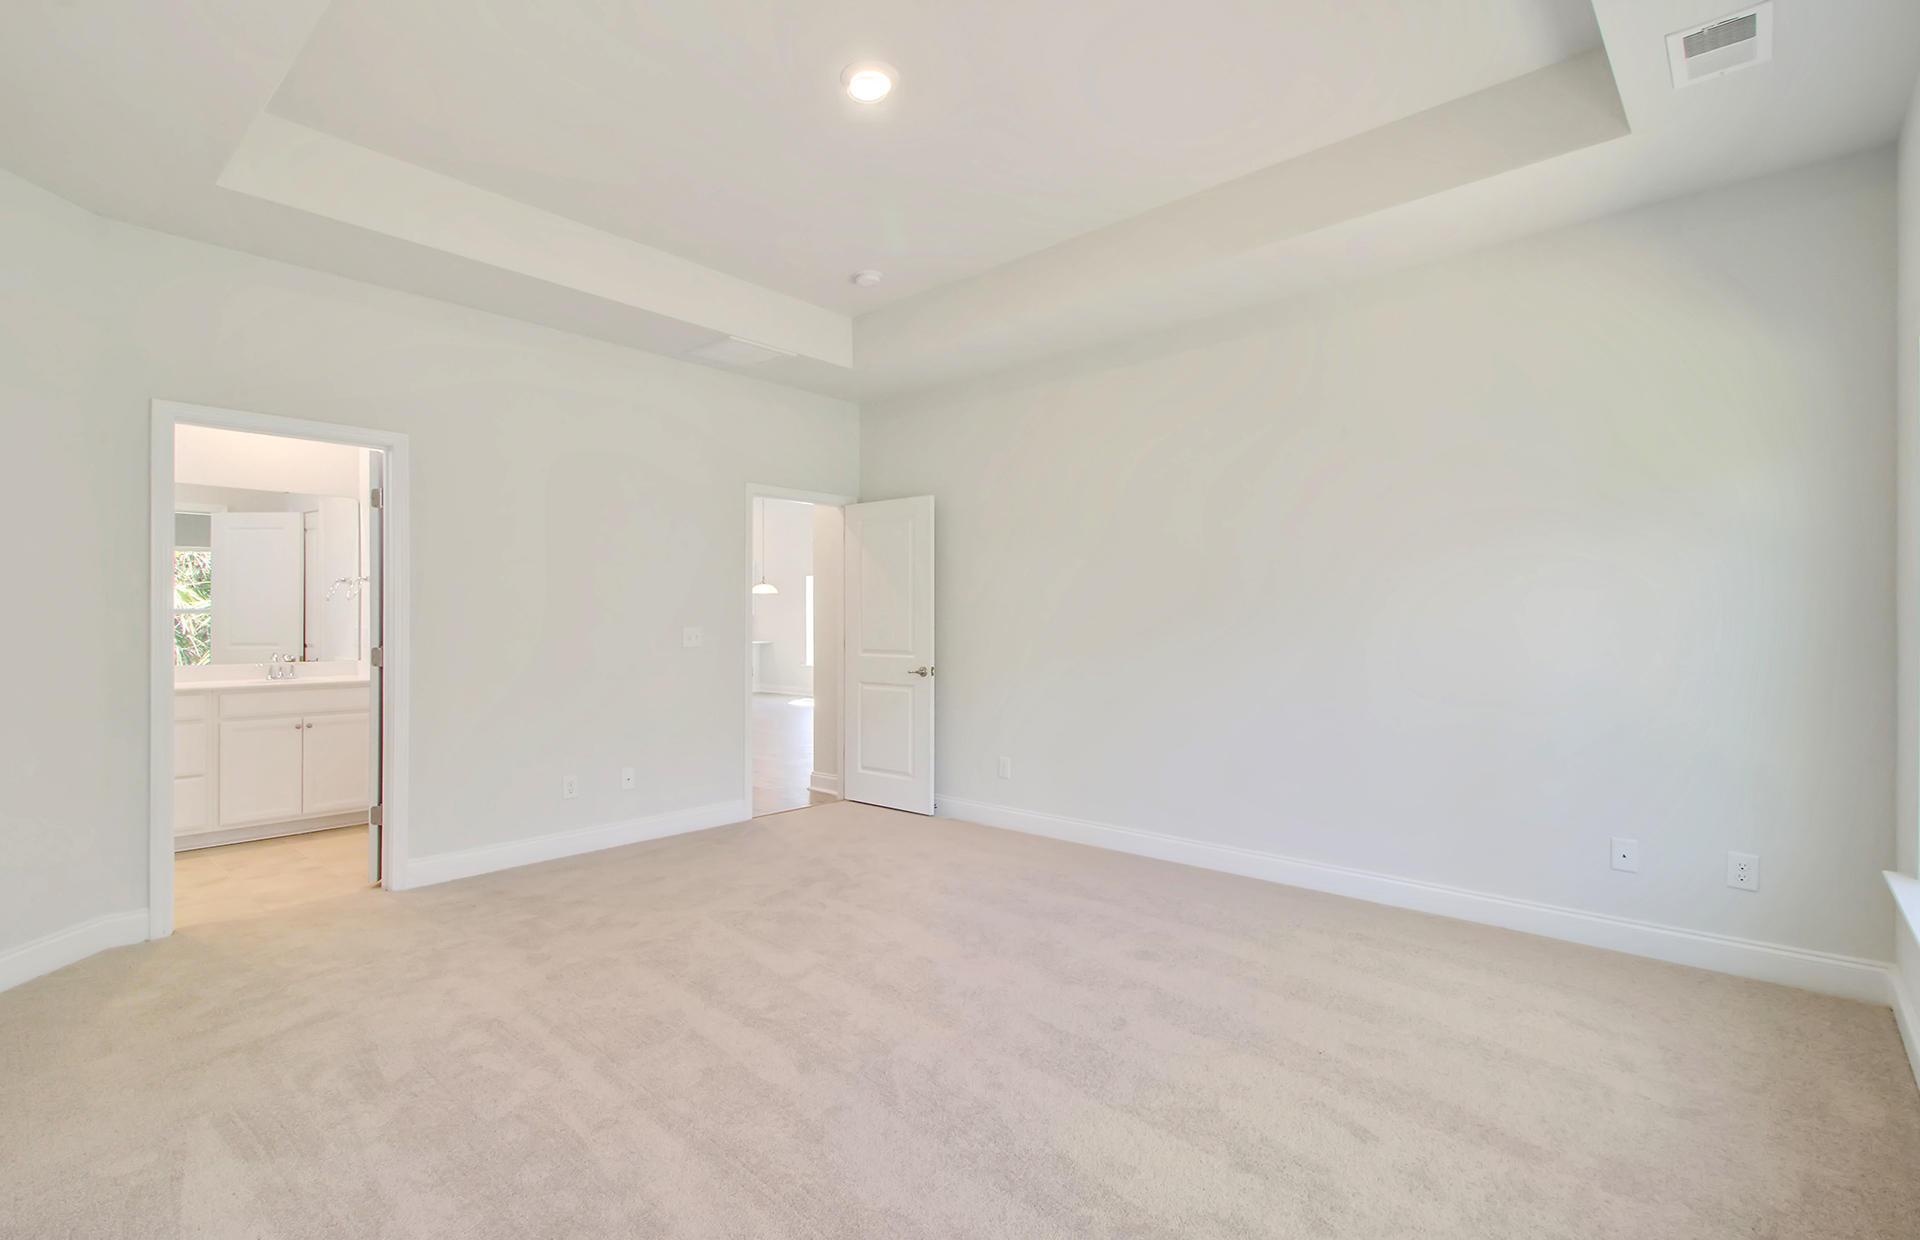 Park West Homes For Sale - 3062 Rice Field, Mount Pleasant, SC - 2